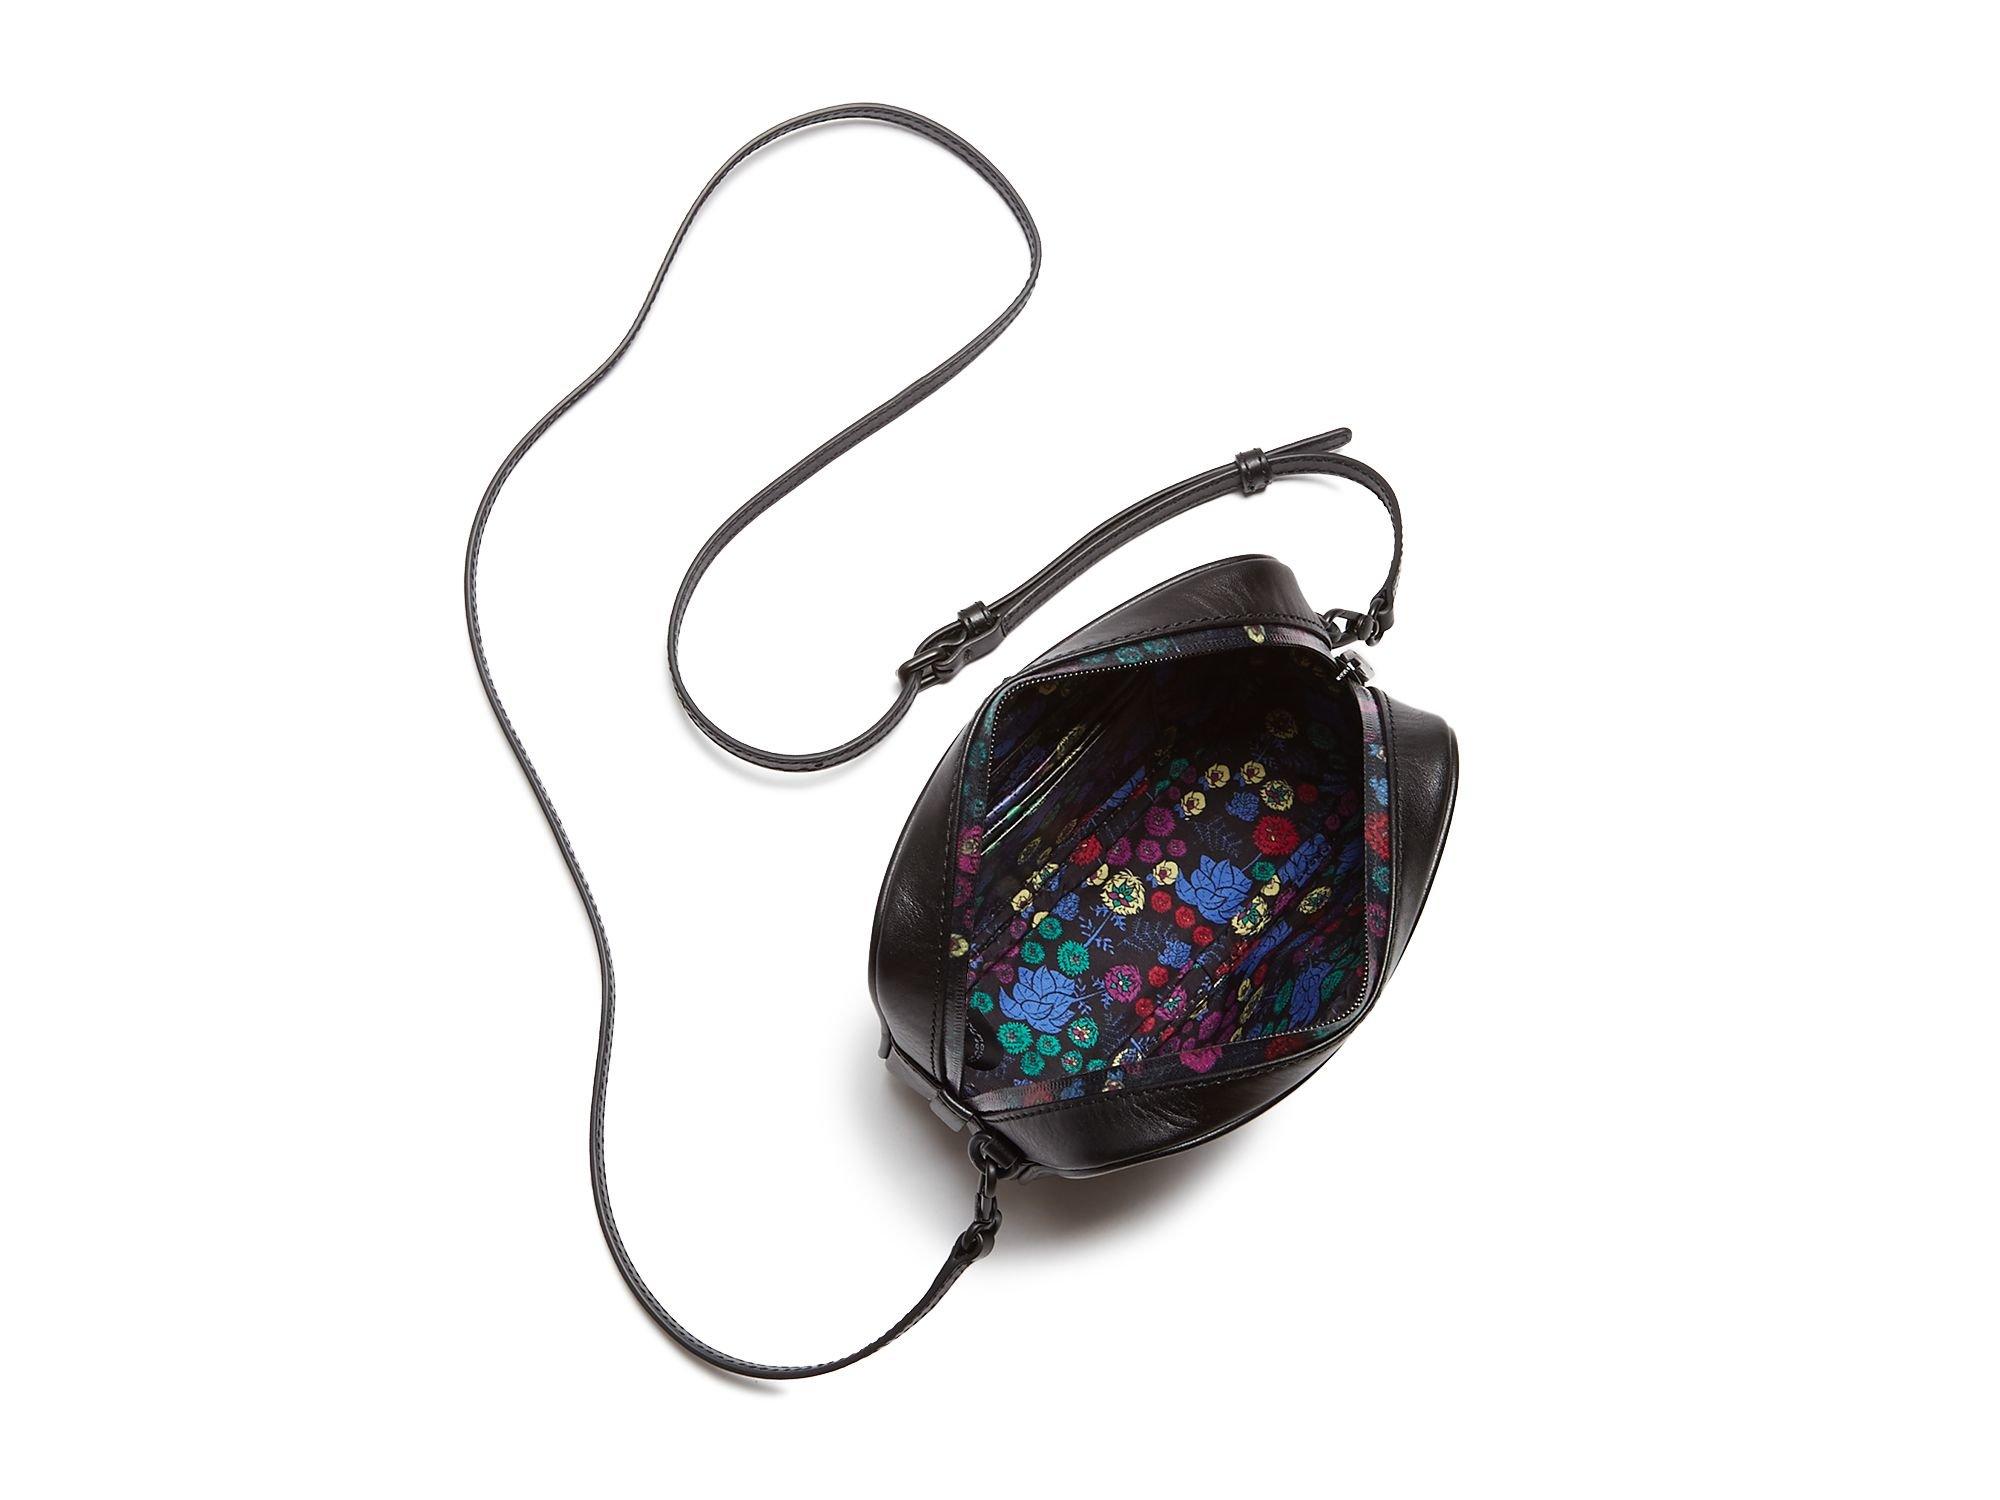 0988aa57958f Lyst - Marc By Marc Jacobs Disney Camera Bag Crossbody in Black